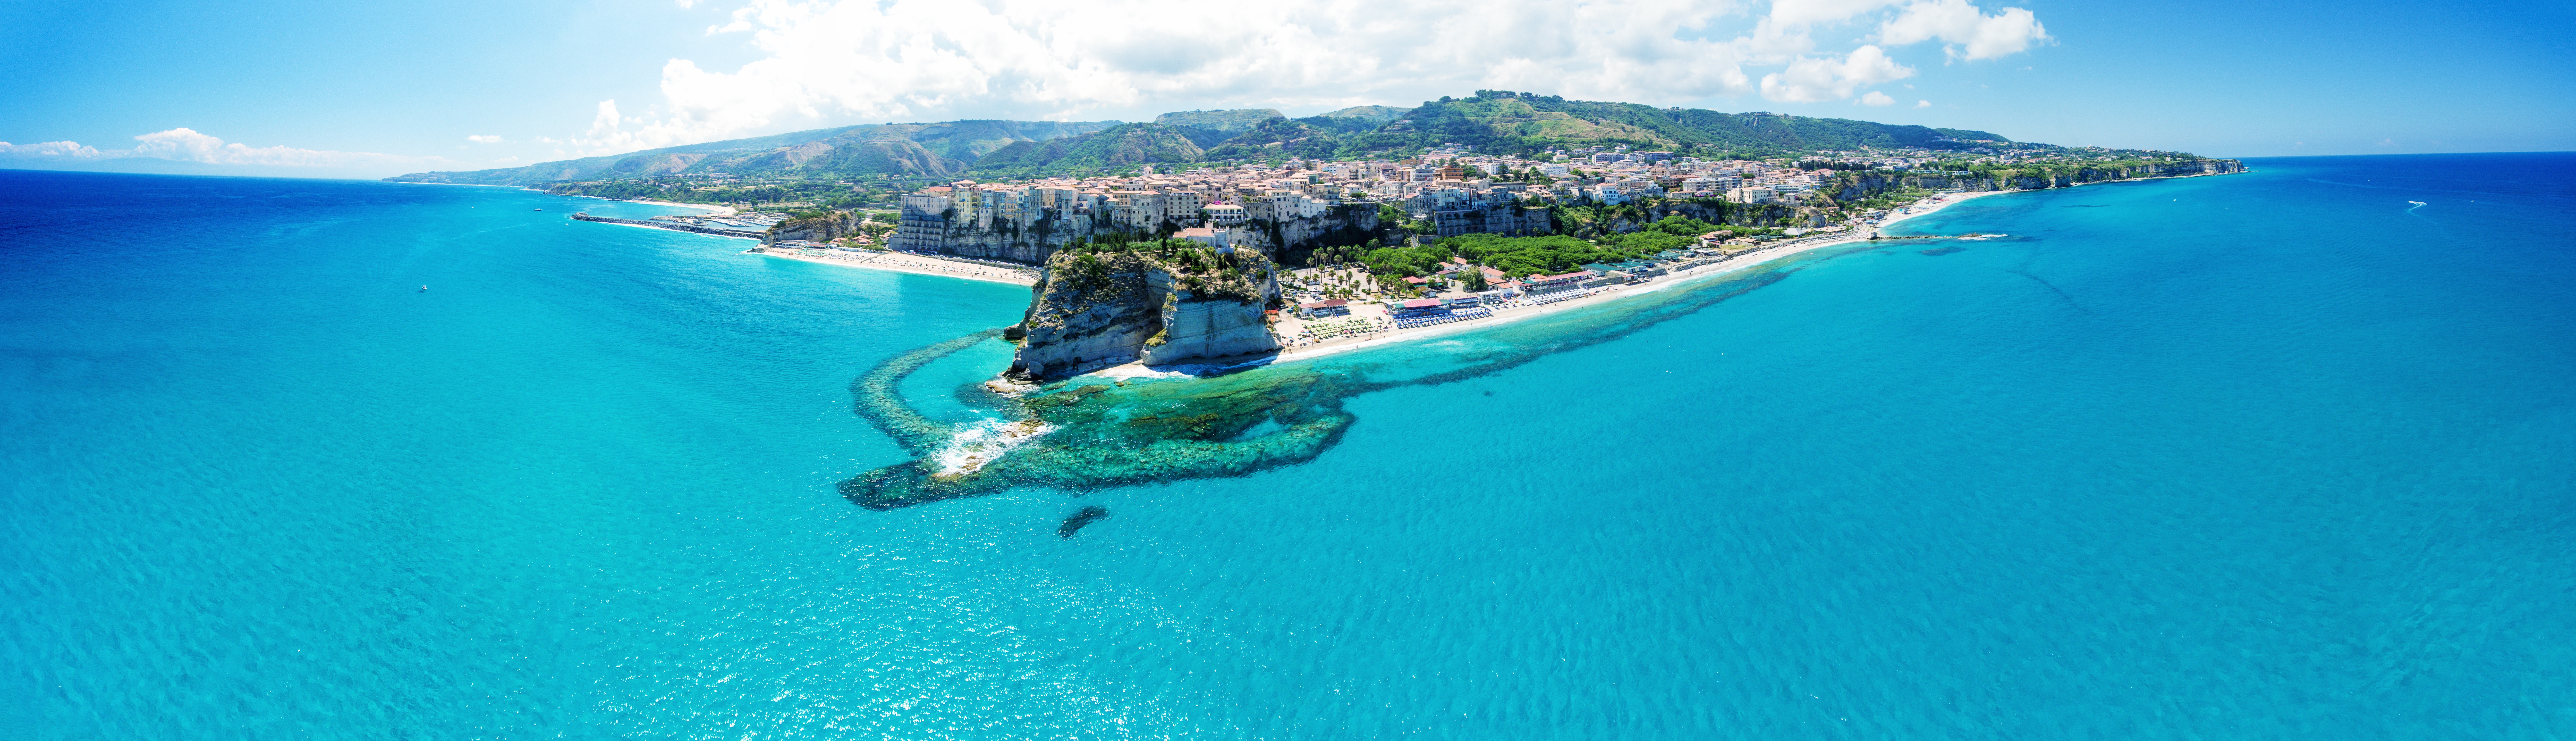 Panorama di Tropea-Calabria